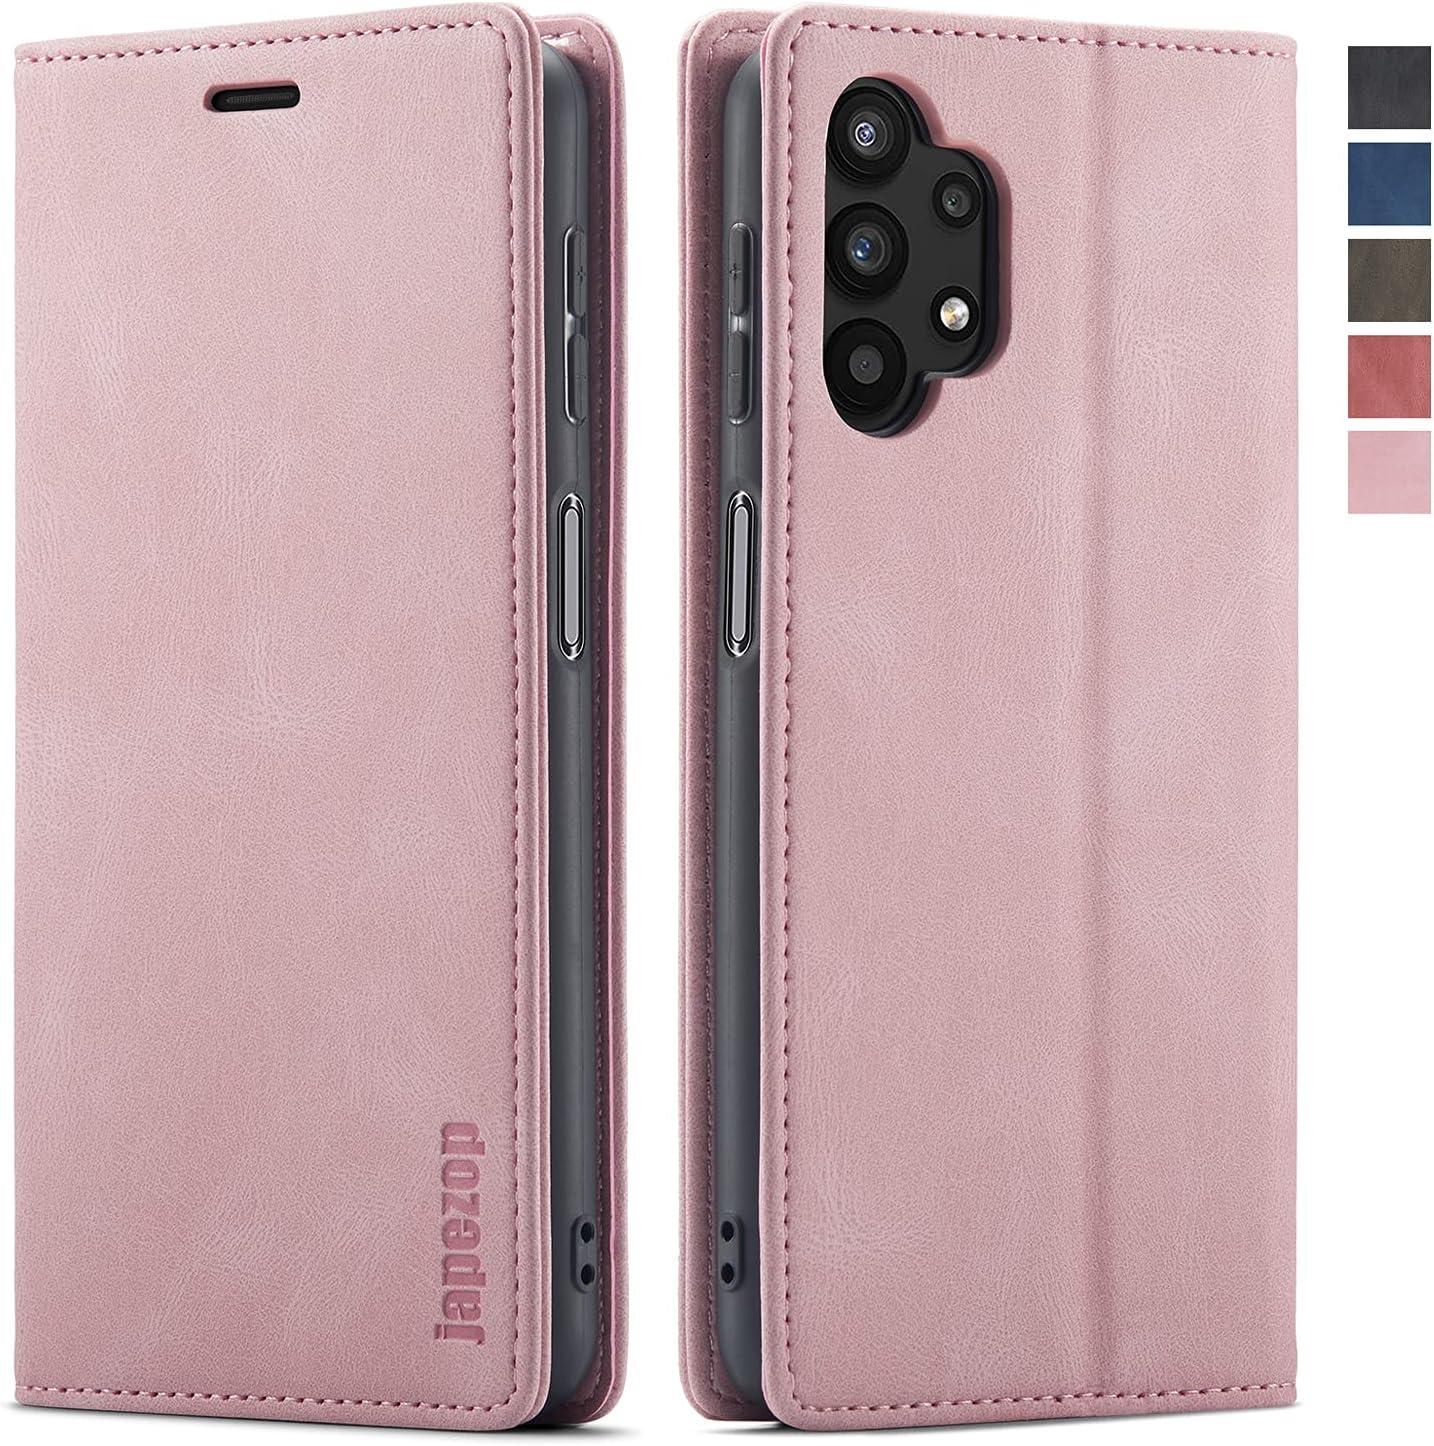 Samsung Galaxy A32 5G Case,Samsung Galaxy A32 5G Wallet Case with [RFID Blocking] Card Holder Kickstand Magnetic,Leather Flip Case for Samsung Galaxy A32 5G (Pink)